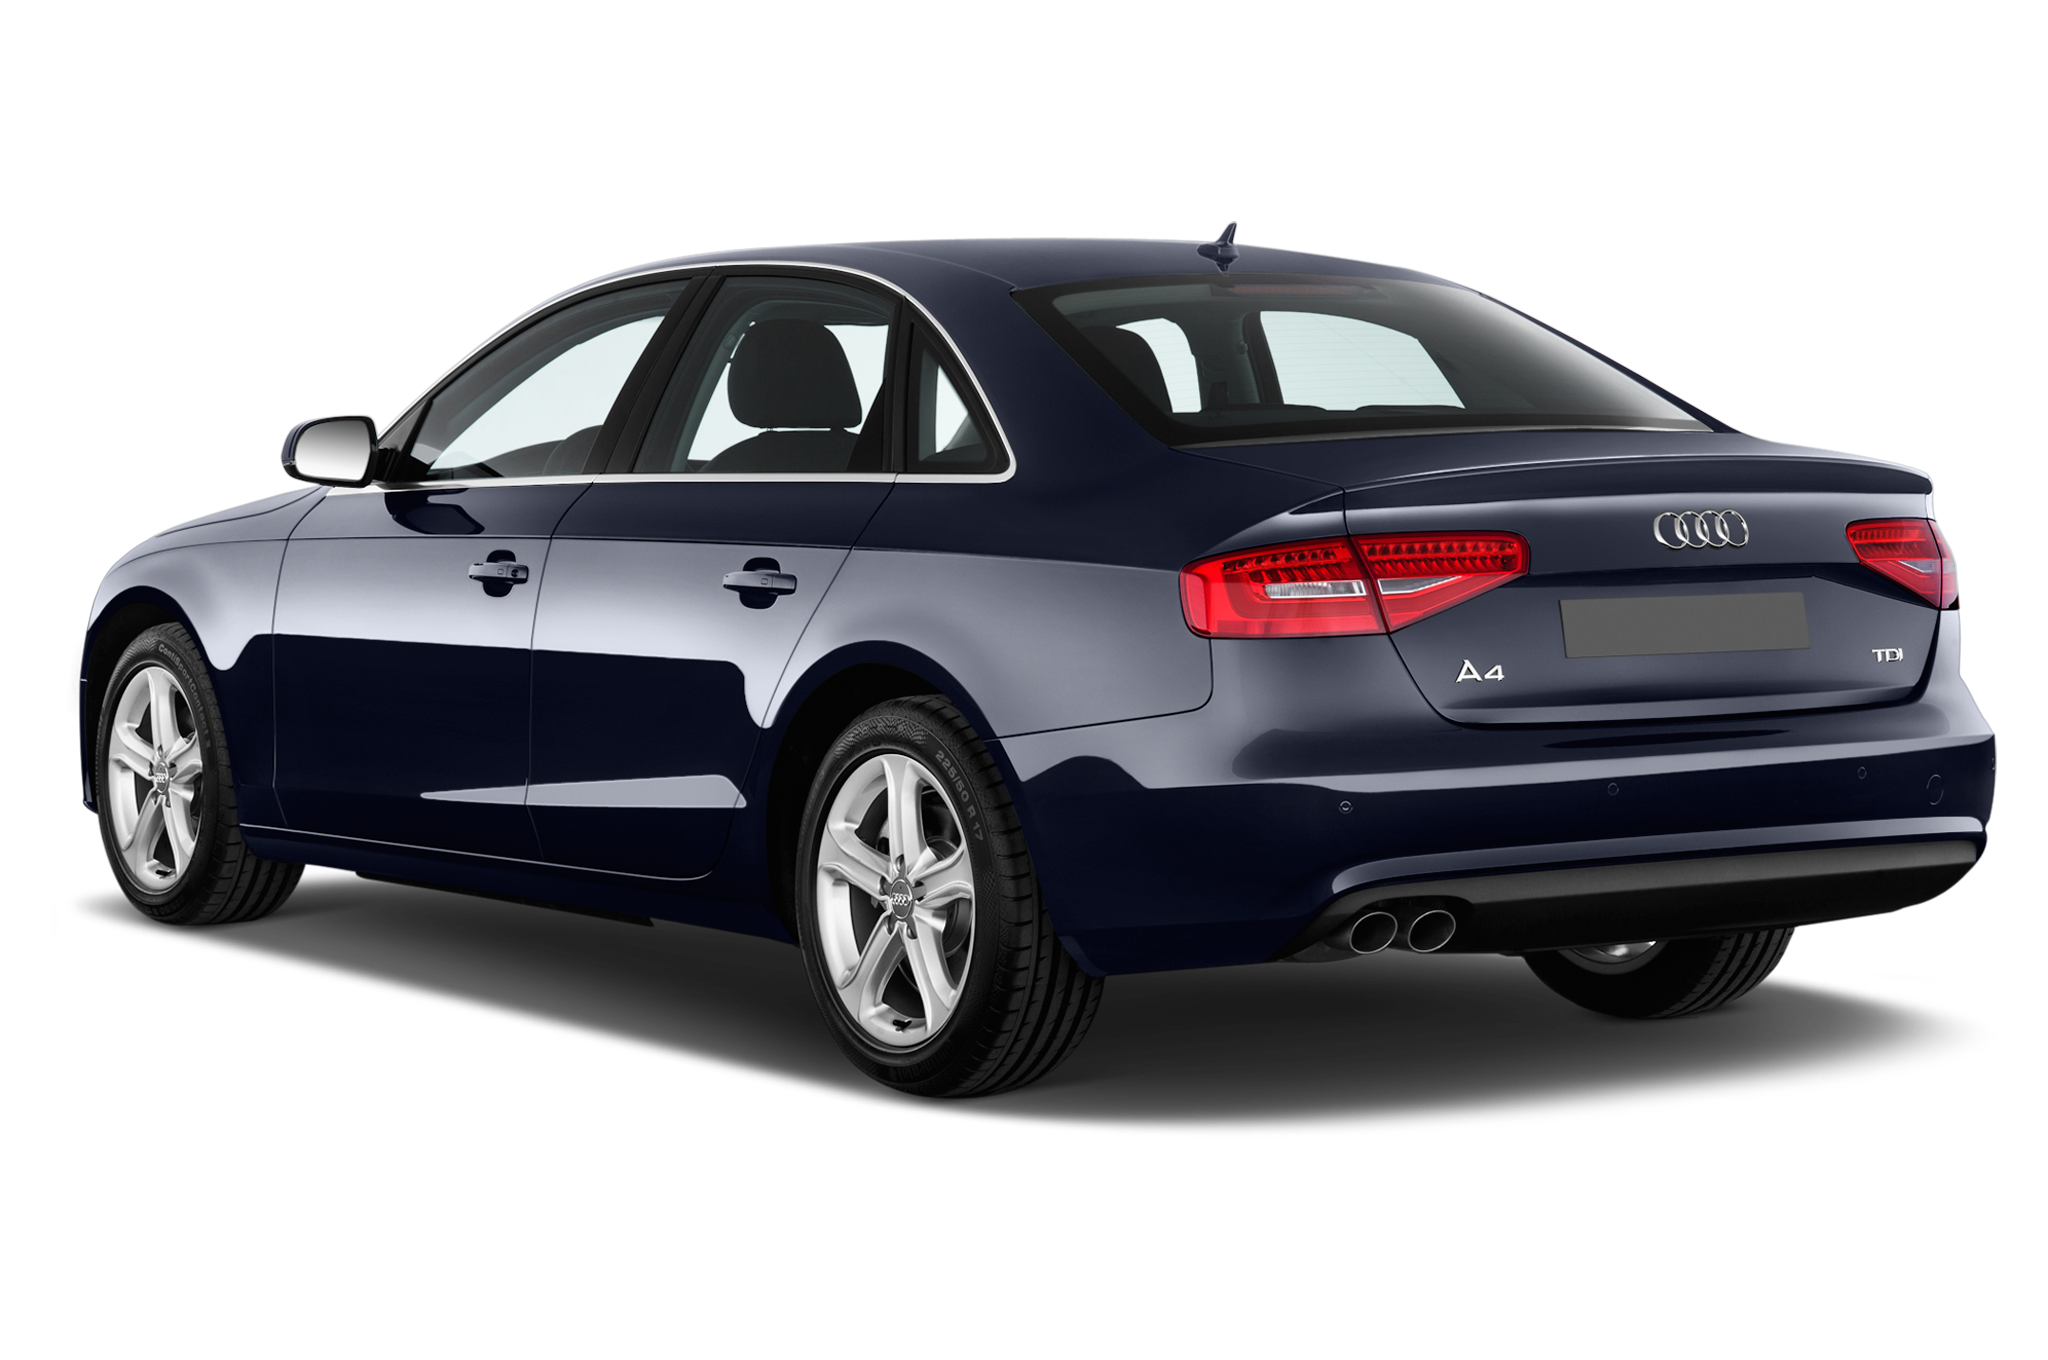 2013 Audi A4 Premium Plus Editors Notebook Automobile